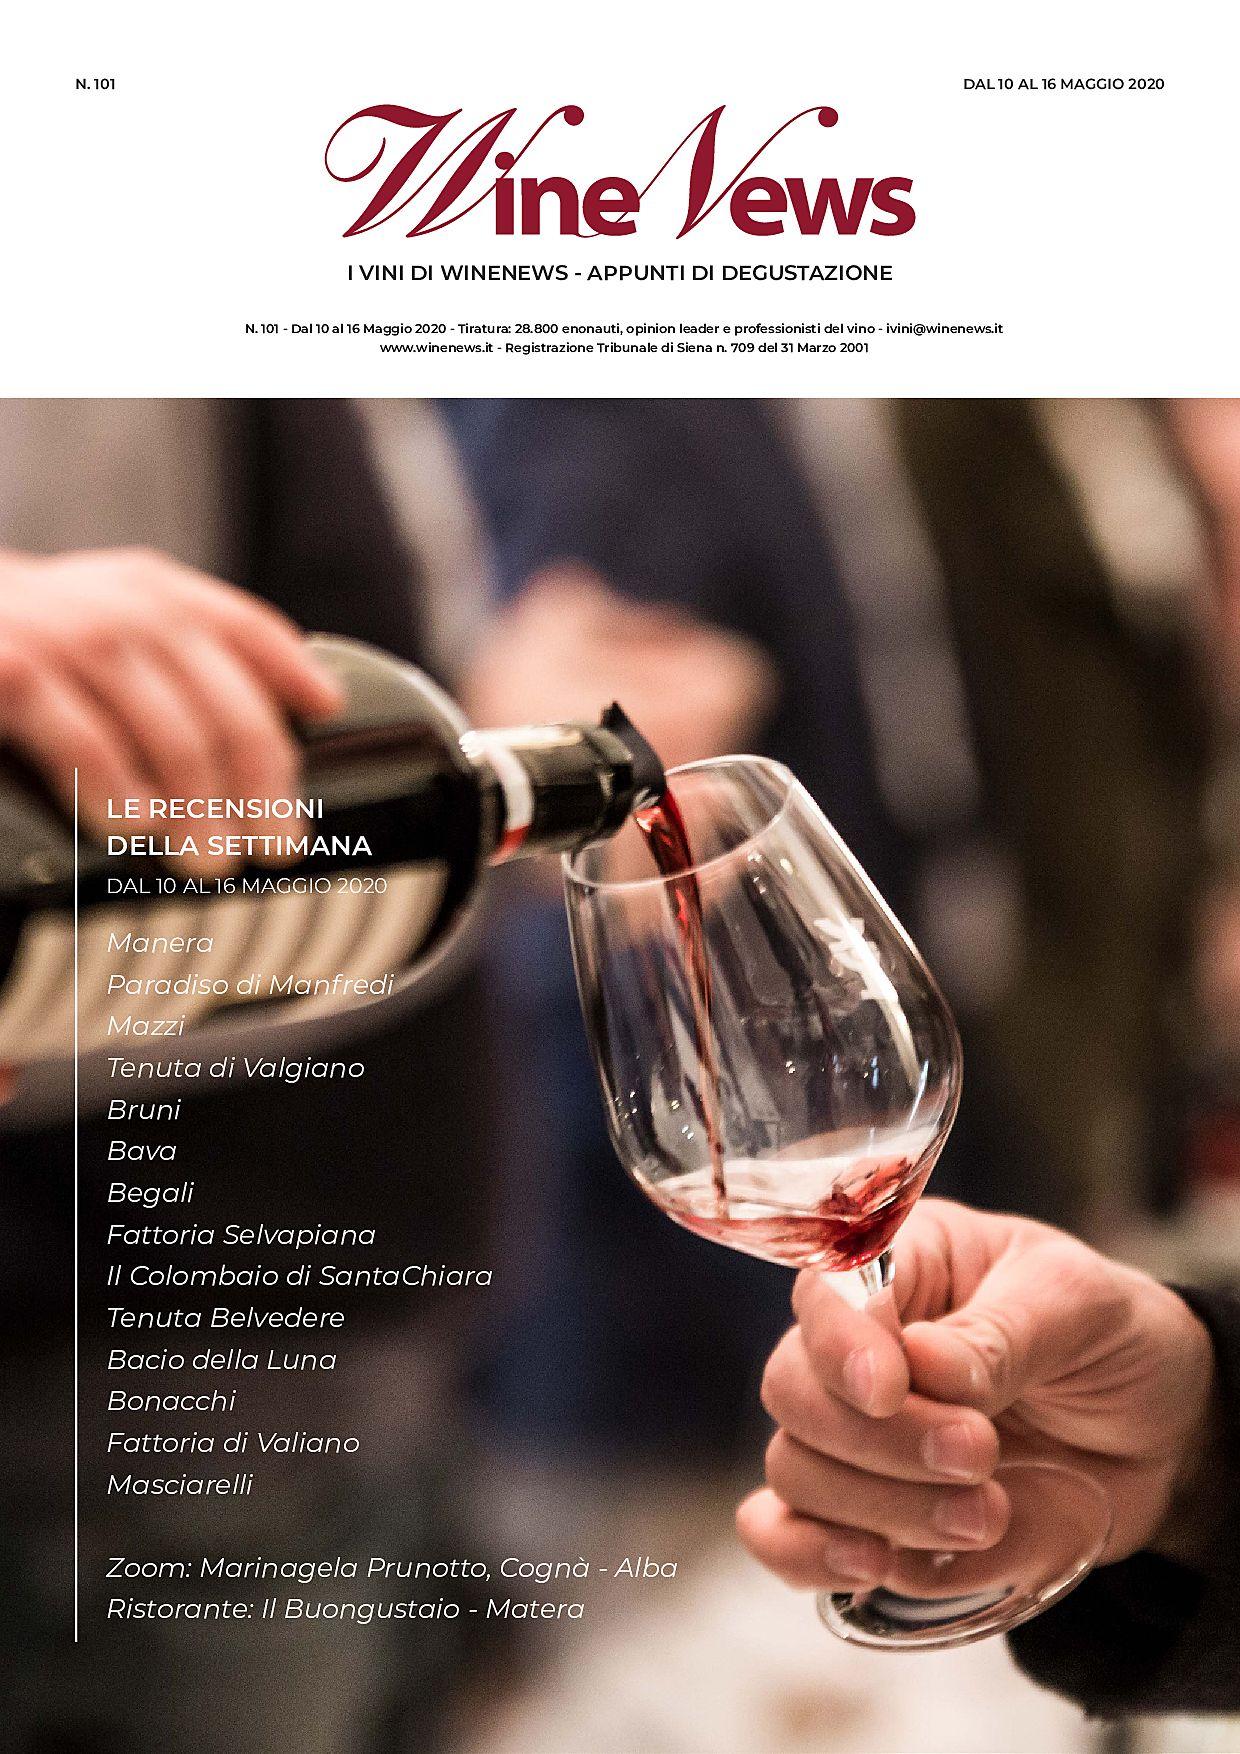 https://winenews.it/php/redirect_pdf.php?id=416399&t=1588957598